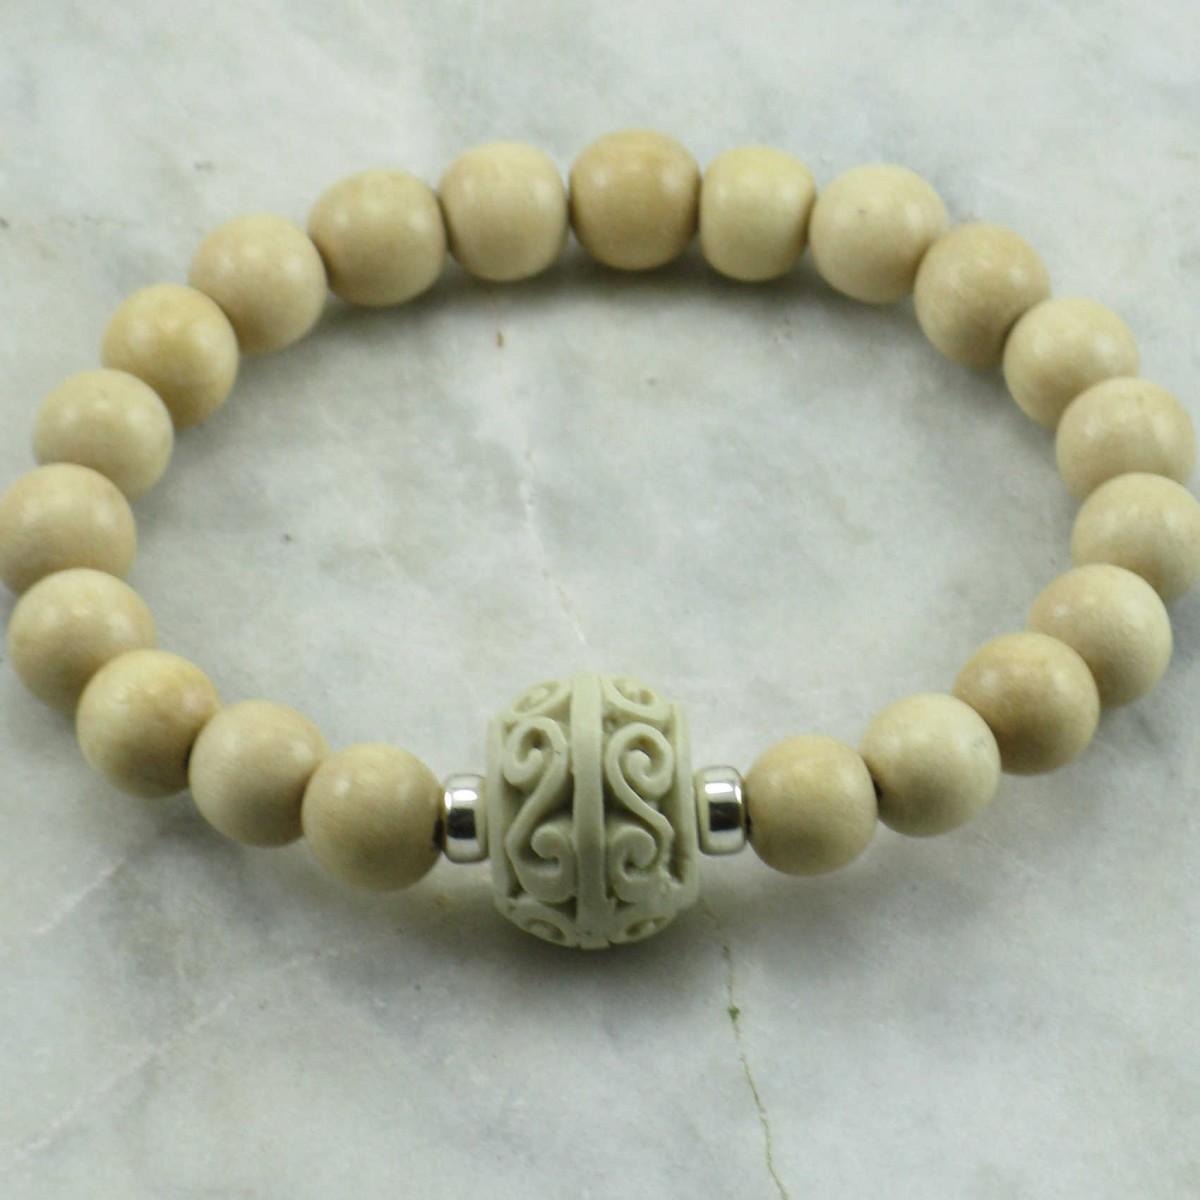 Peace_Mala_Bracelet_21_Wood _Mala_Beads_Buddhist_Bracelet